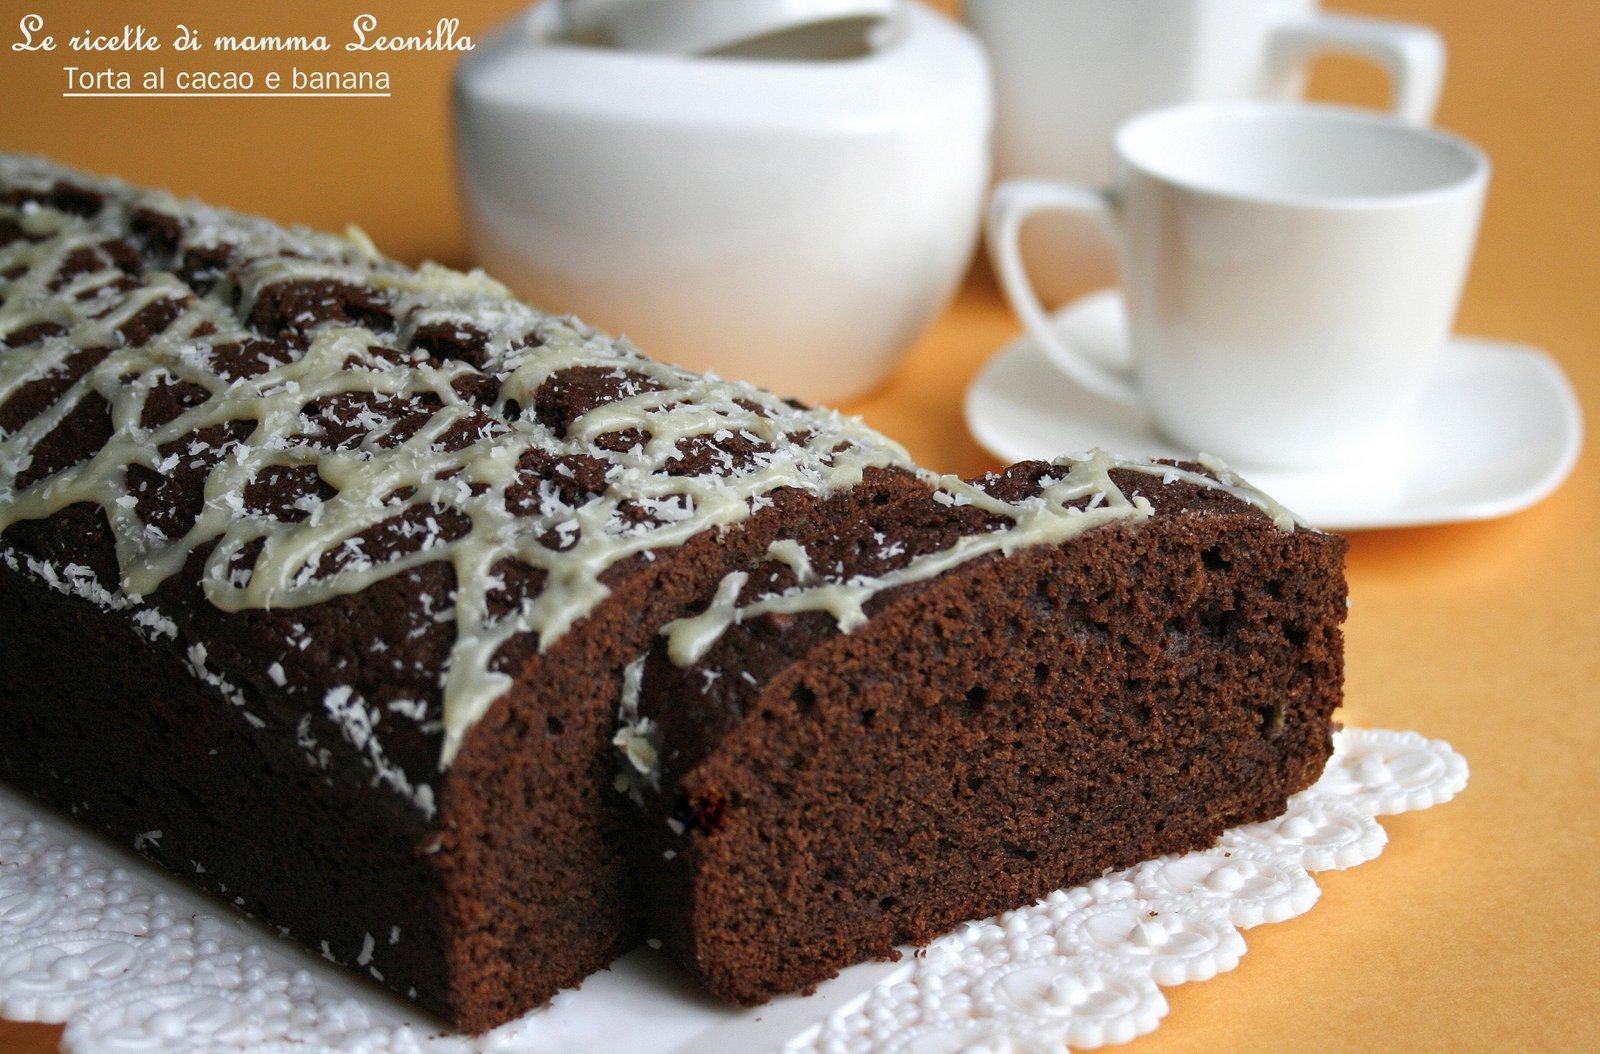 Ricette torte al cioccolato e yogurt